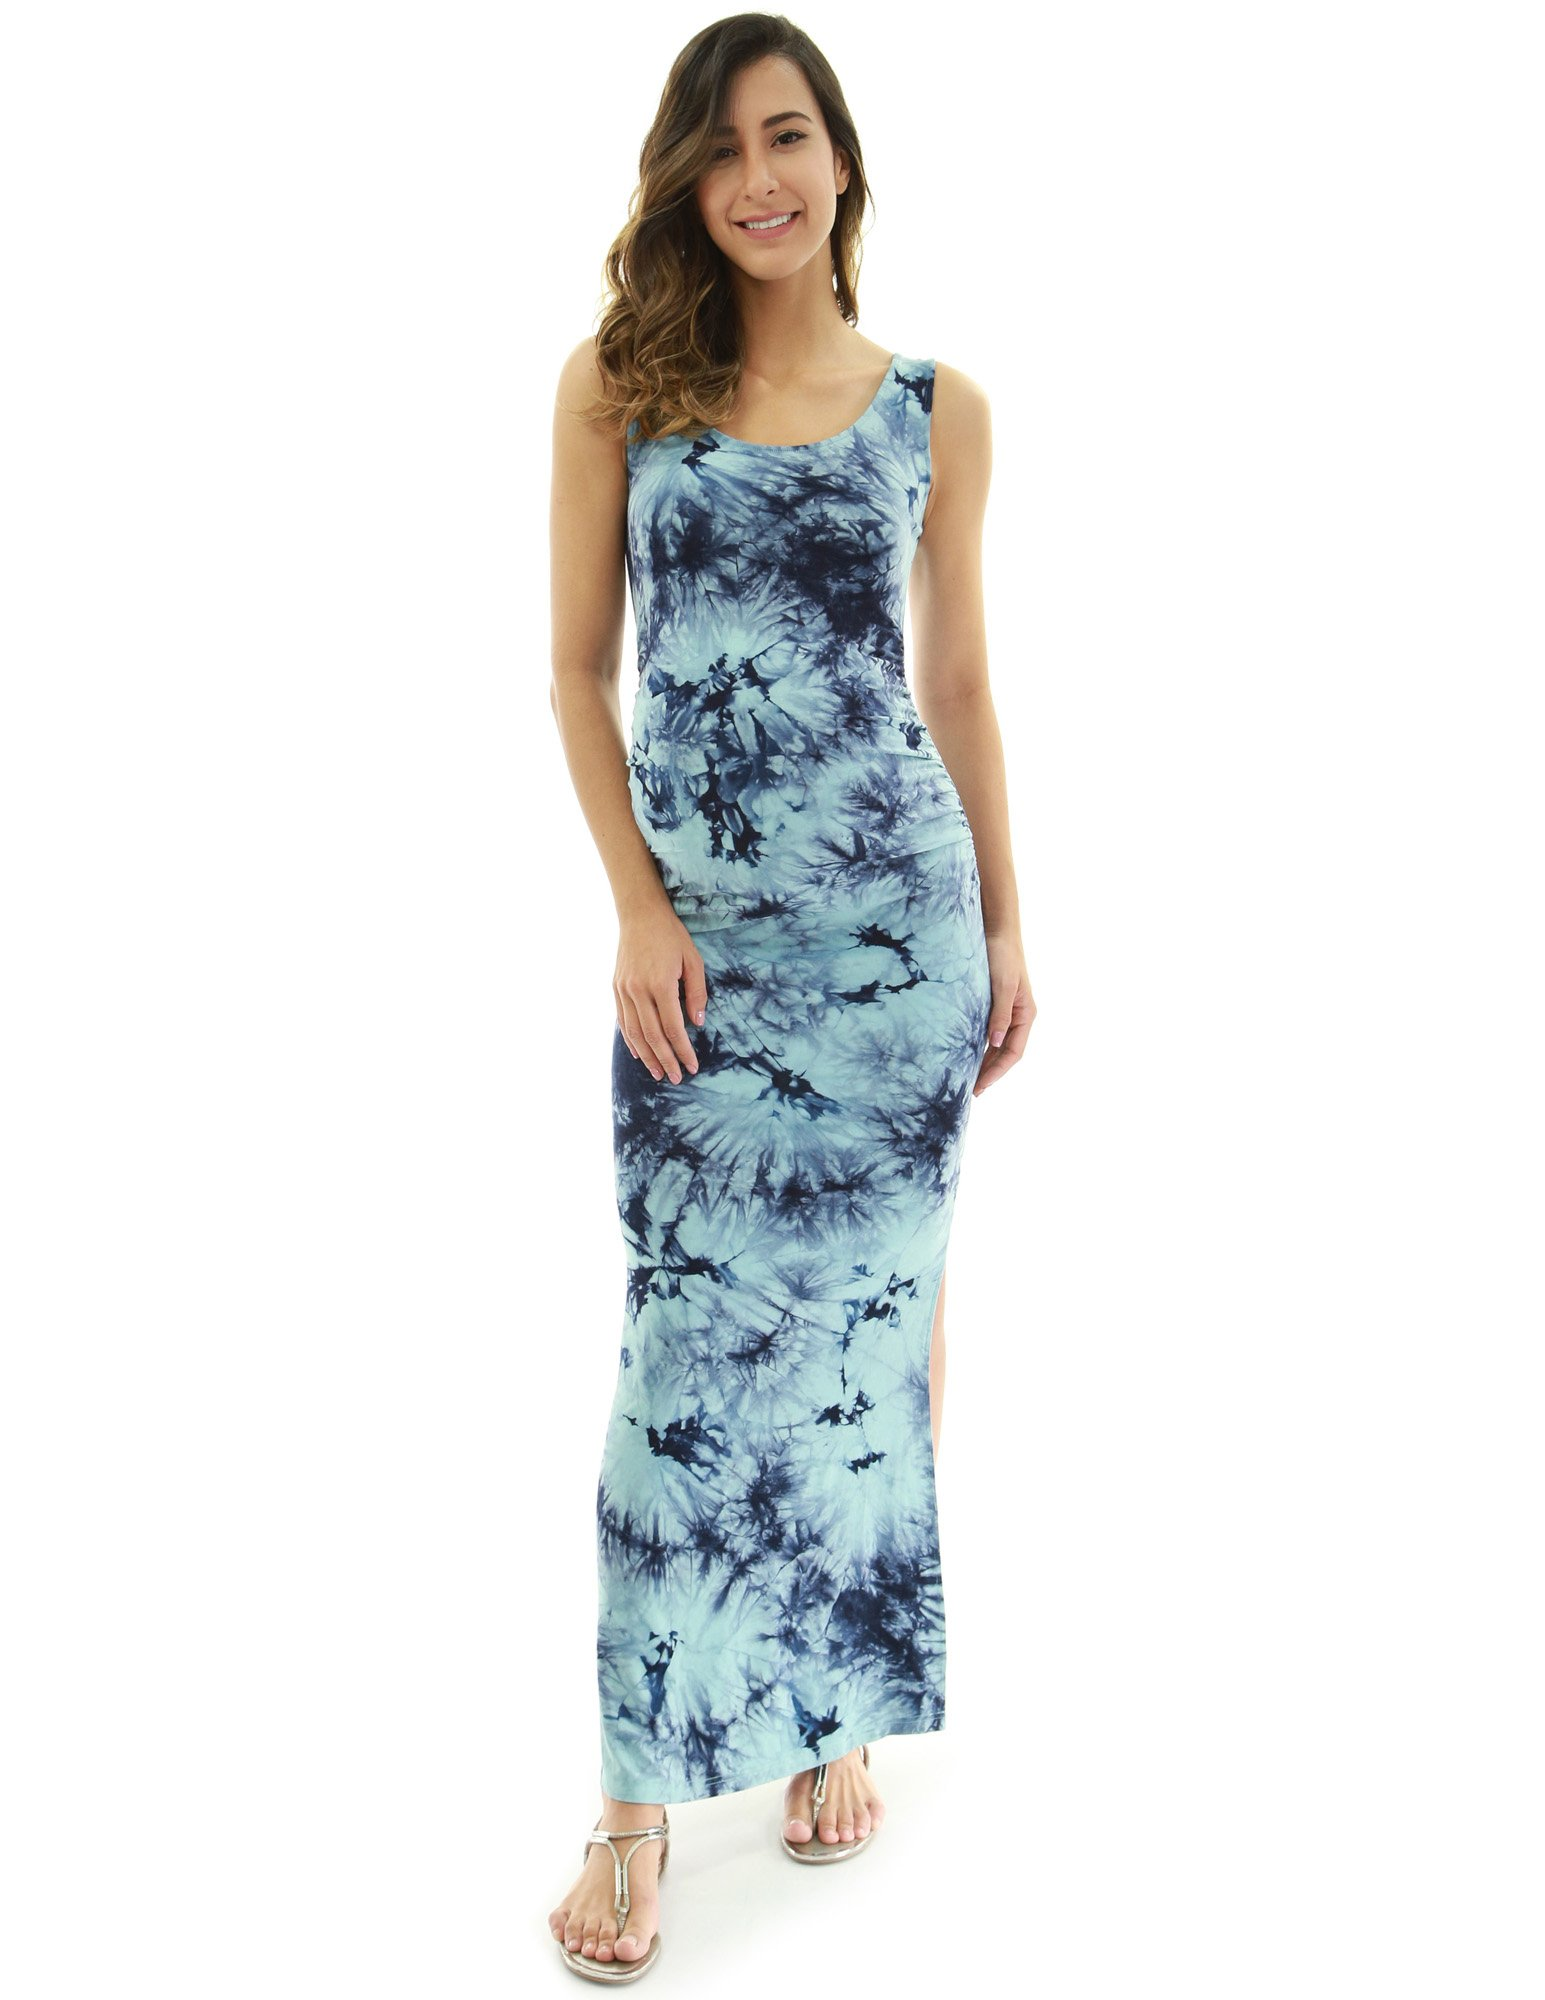 PattyBoutik Mama Tie-Dye/Solid Scoop Neck Sleeveless Maxi Dress (Light Blue and Dark Blue 32 Medium)